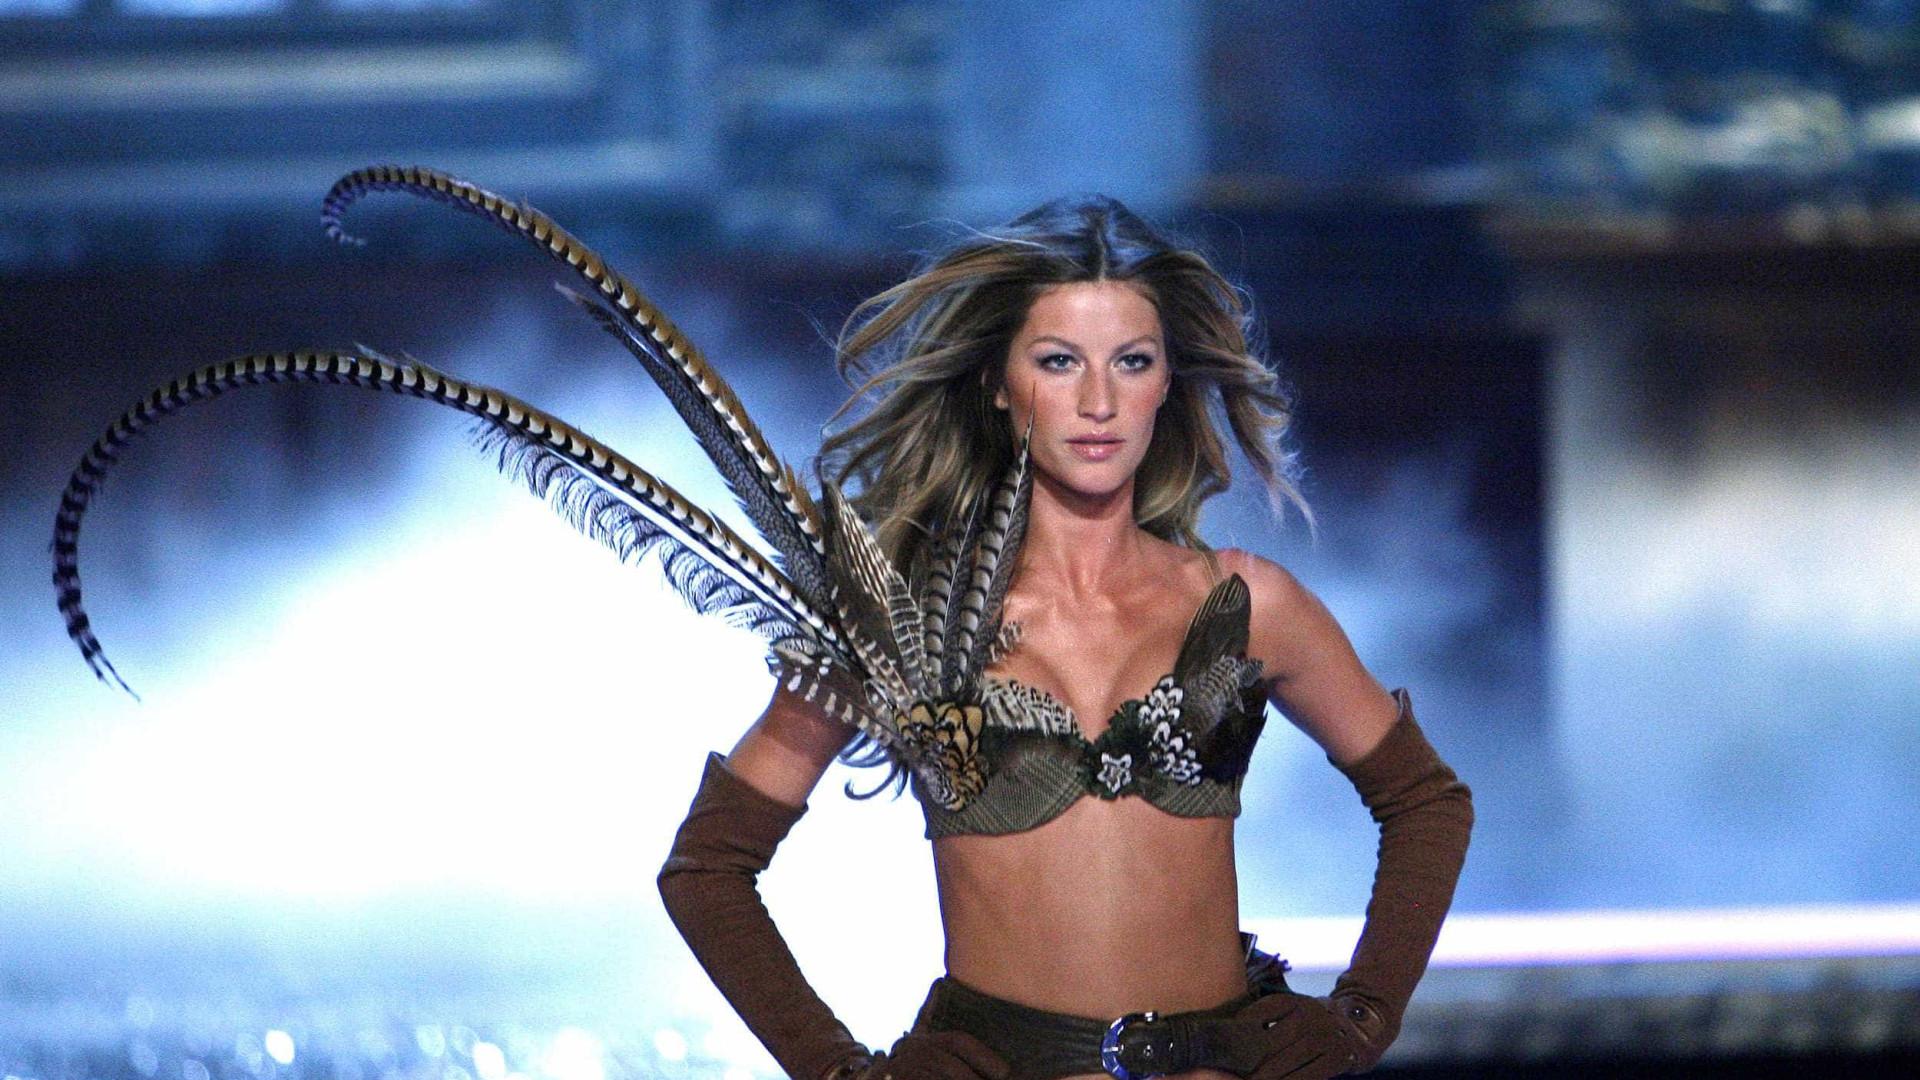 Gisele Bündchen diz que sorteio definiu que deixaria Victoria's Secret